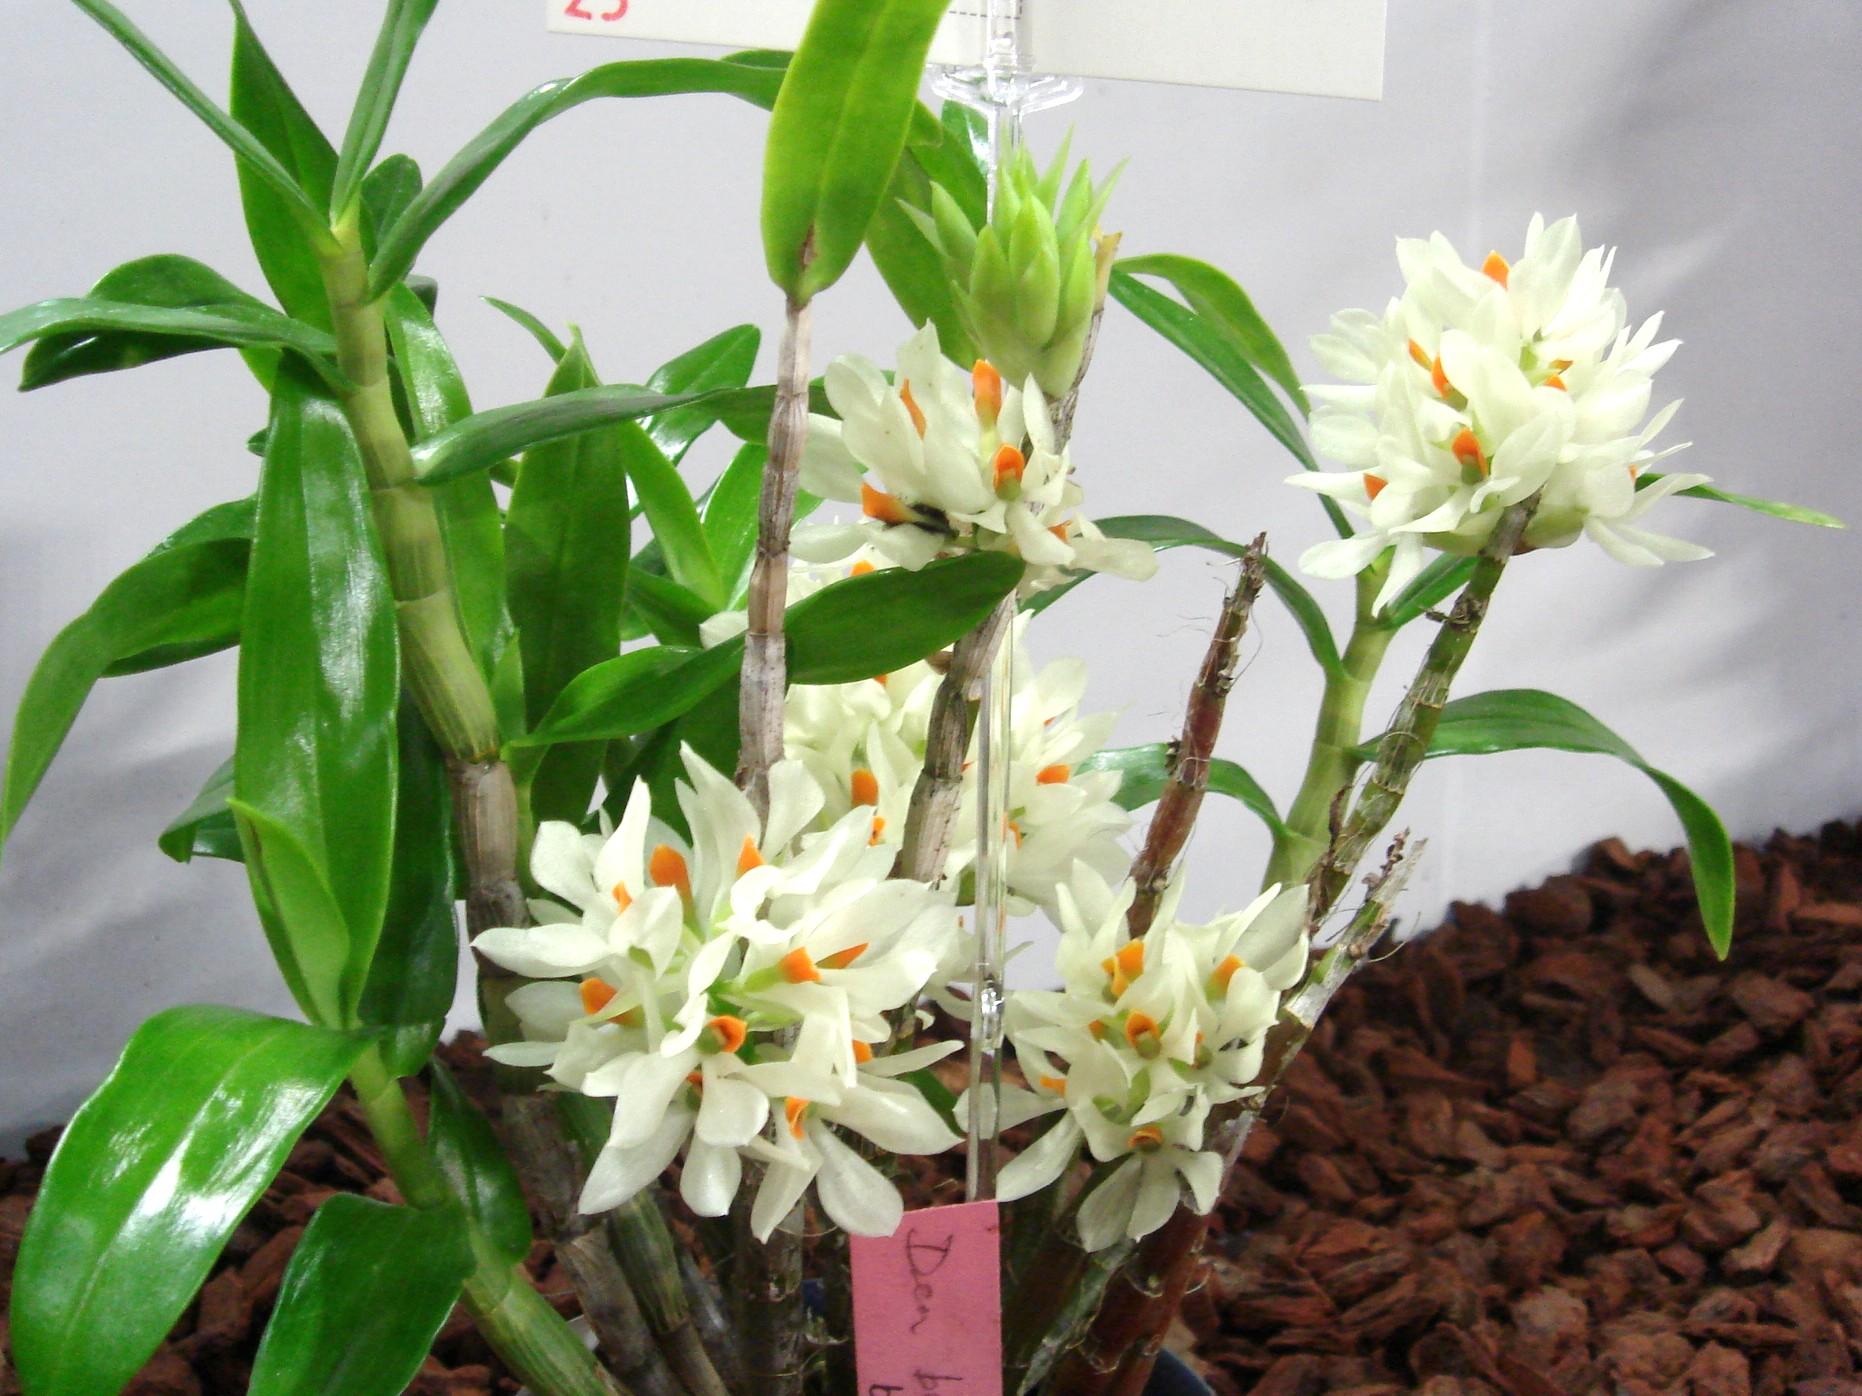 http://orchids.la.coocan.jp/Dendrobium/Dendrobium%20bracteosum/DSC06485.JPG